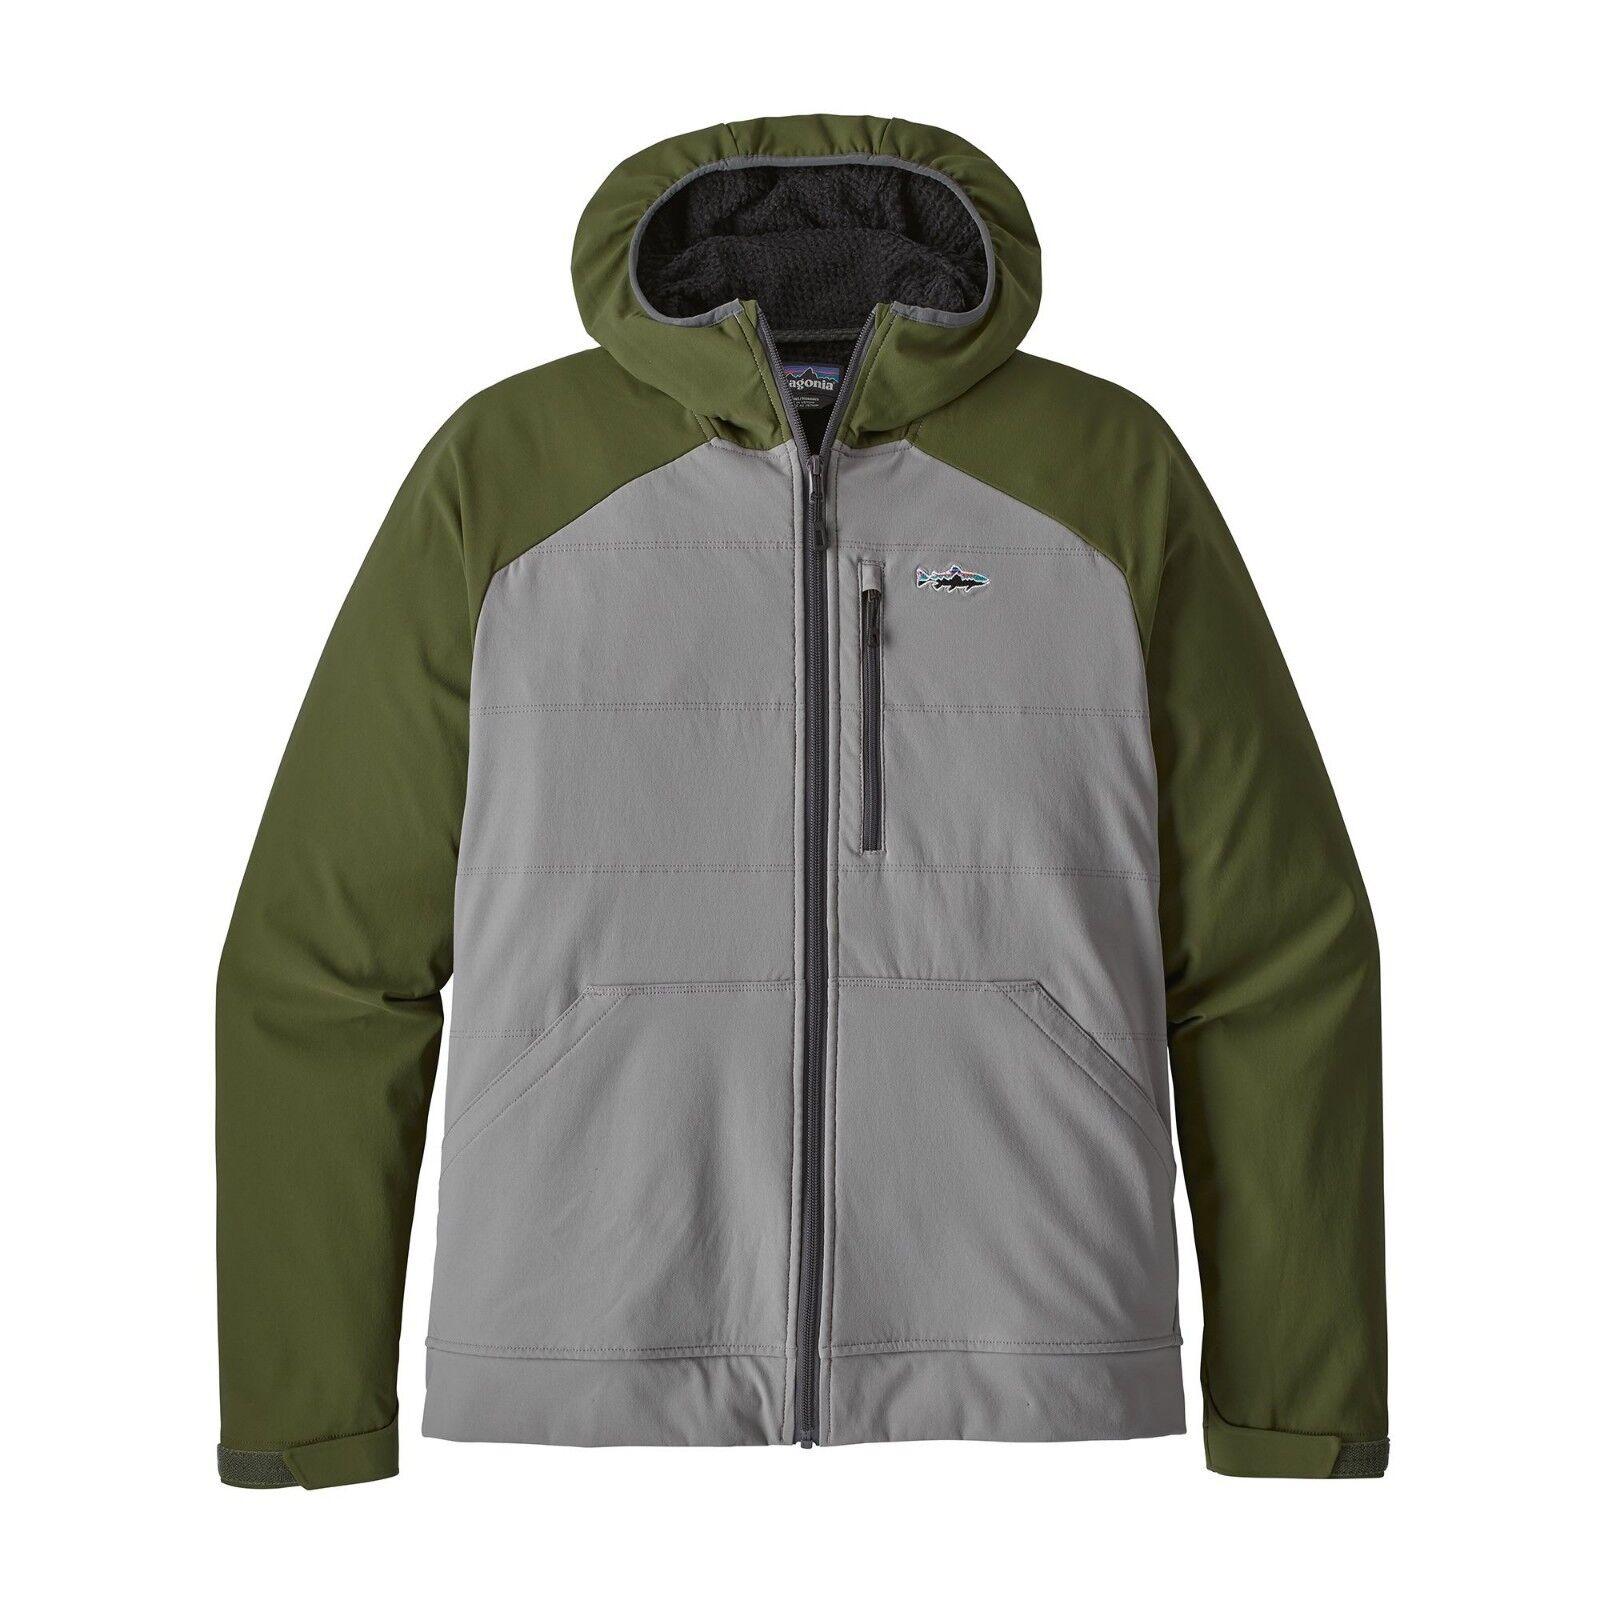 Patagonia uomo SNAP Dry Hoody Jacket-Feather grigio-fea-M Medium